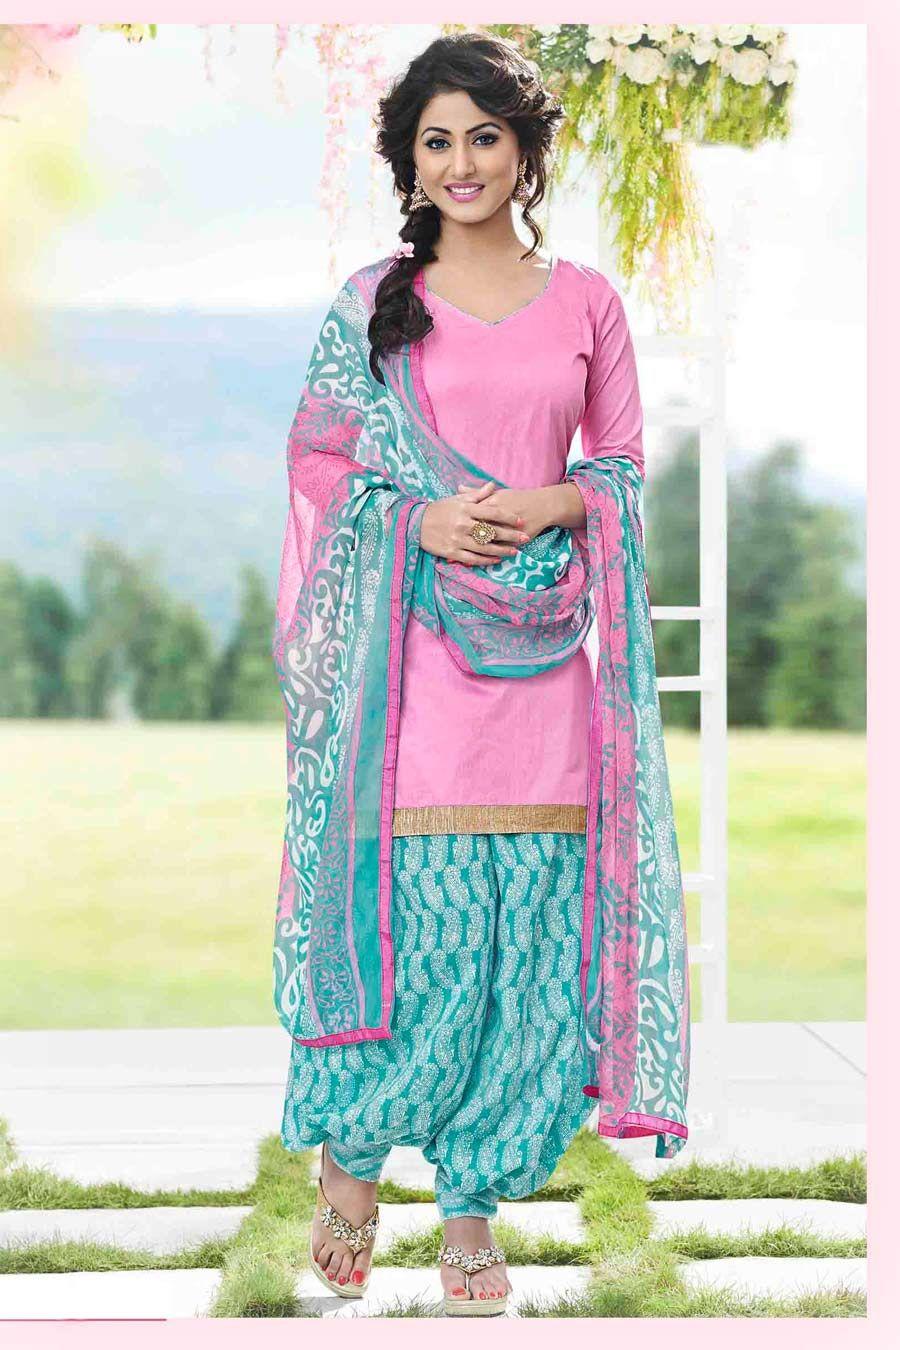 Navy Banglori Silk Semi Stitch Dress | Pinterest | Patiala, Aqua and ...